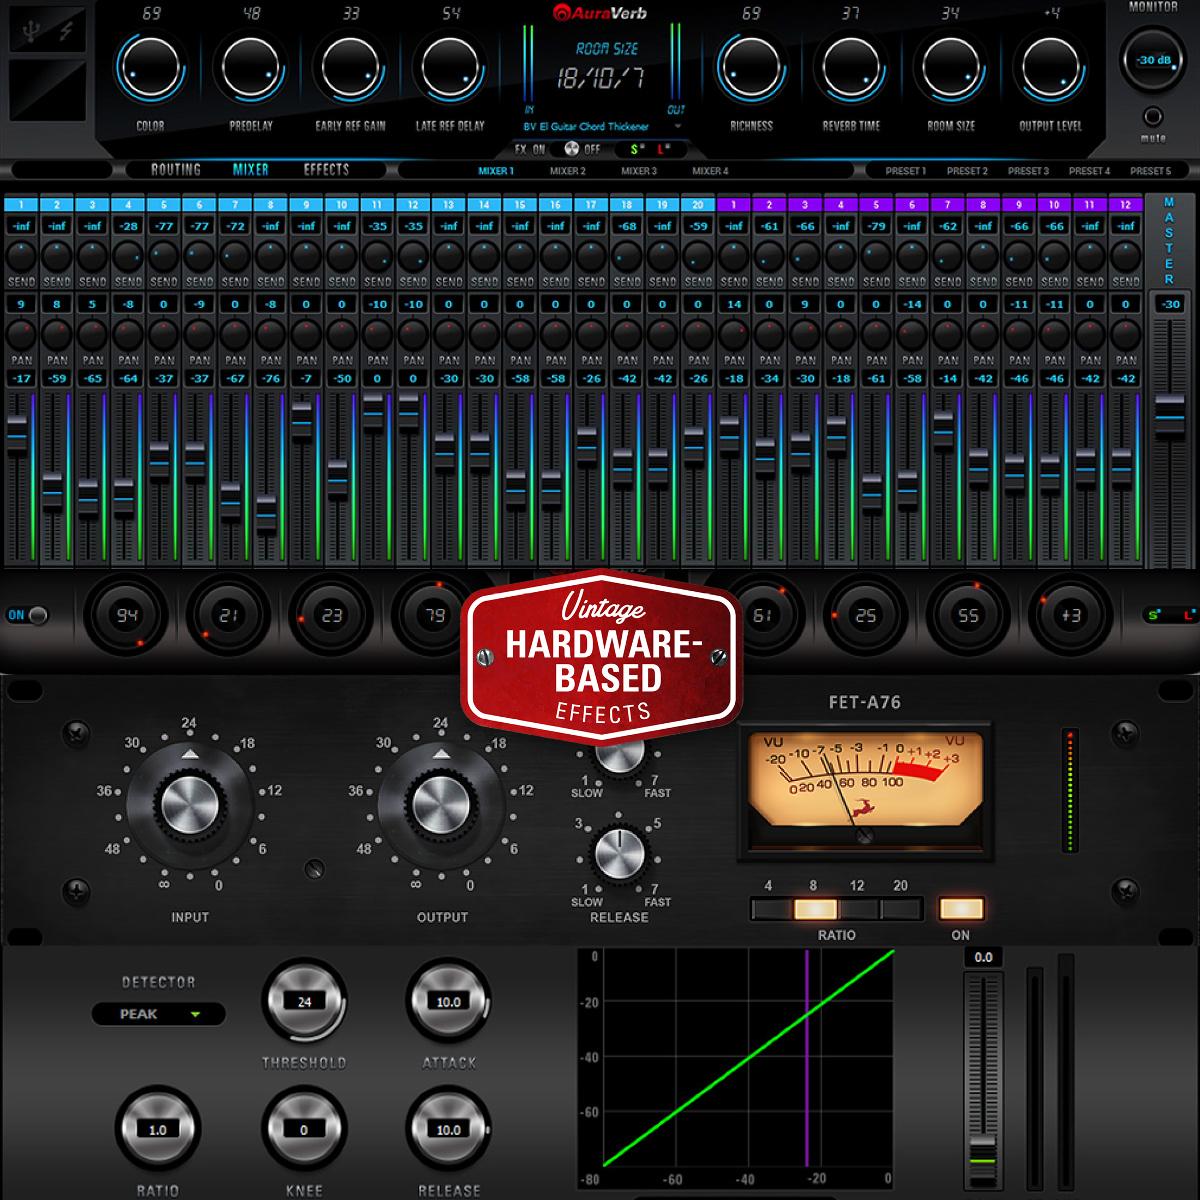 Thunderbolt and USB Audio Interface, 2017 Model